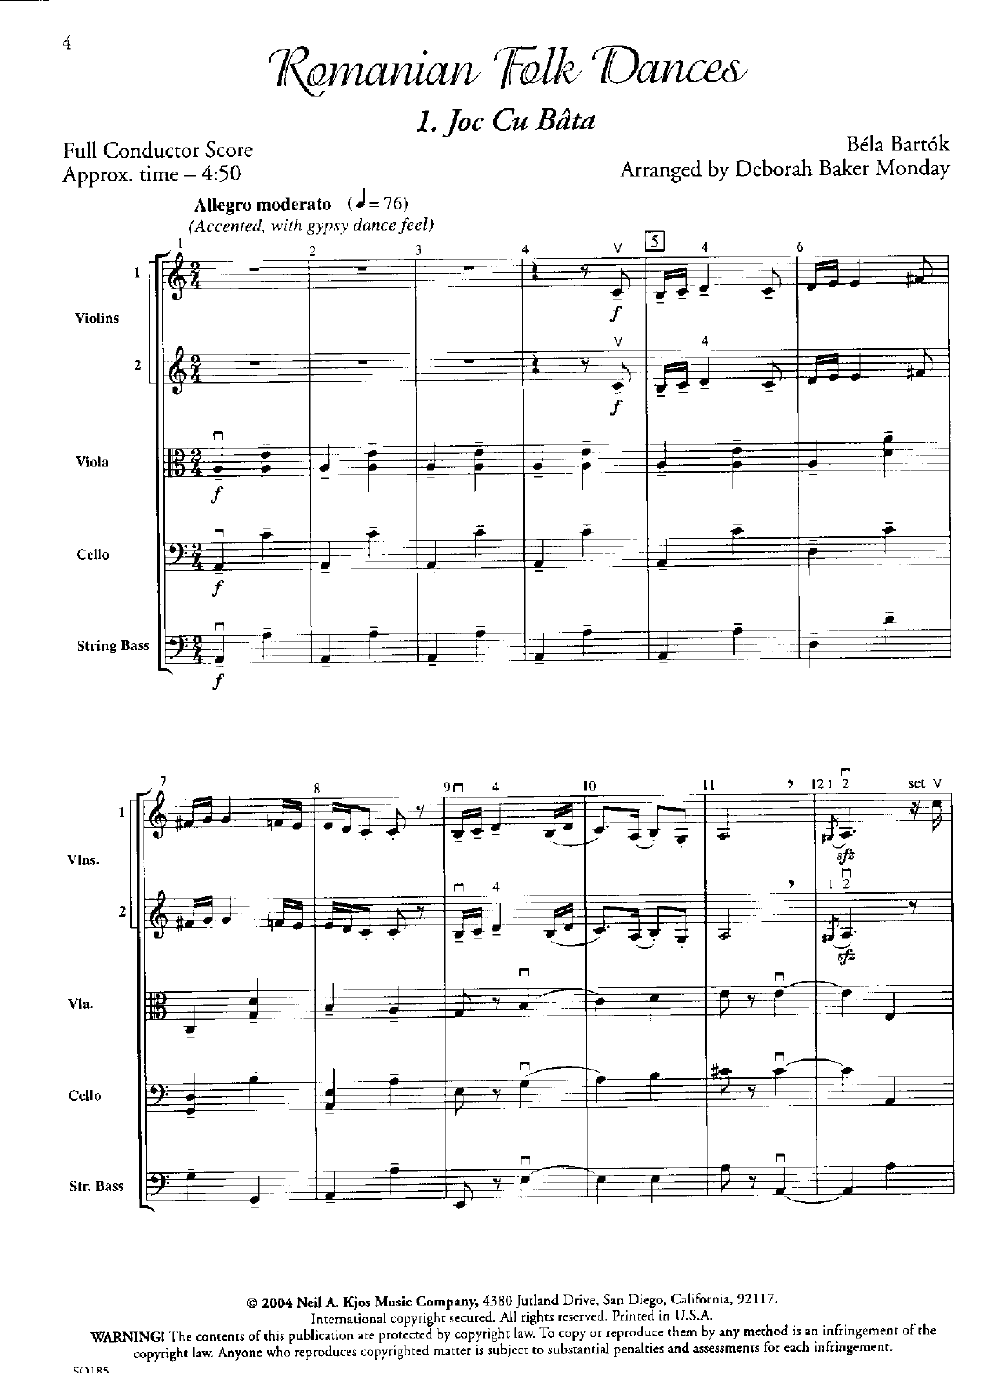 Romanian Folk Dances by Bela Bartok/arr  Monday| J W